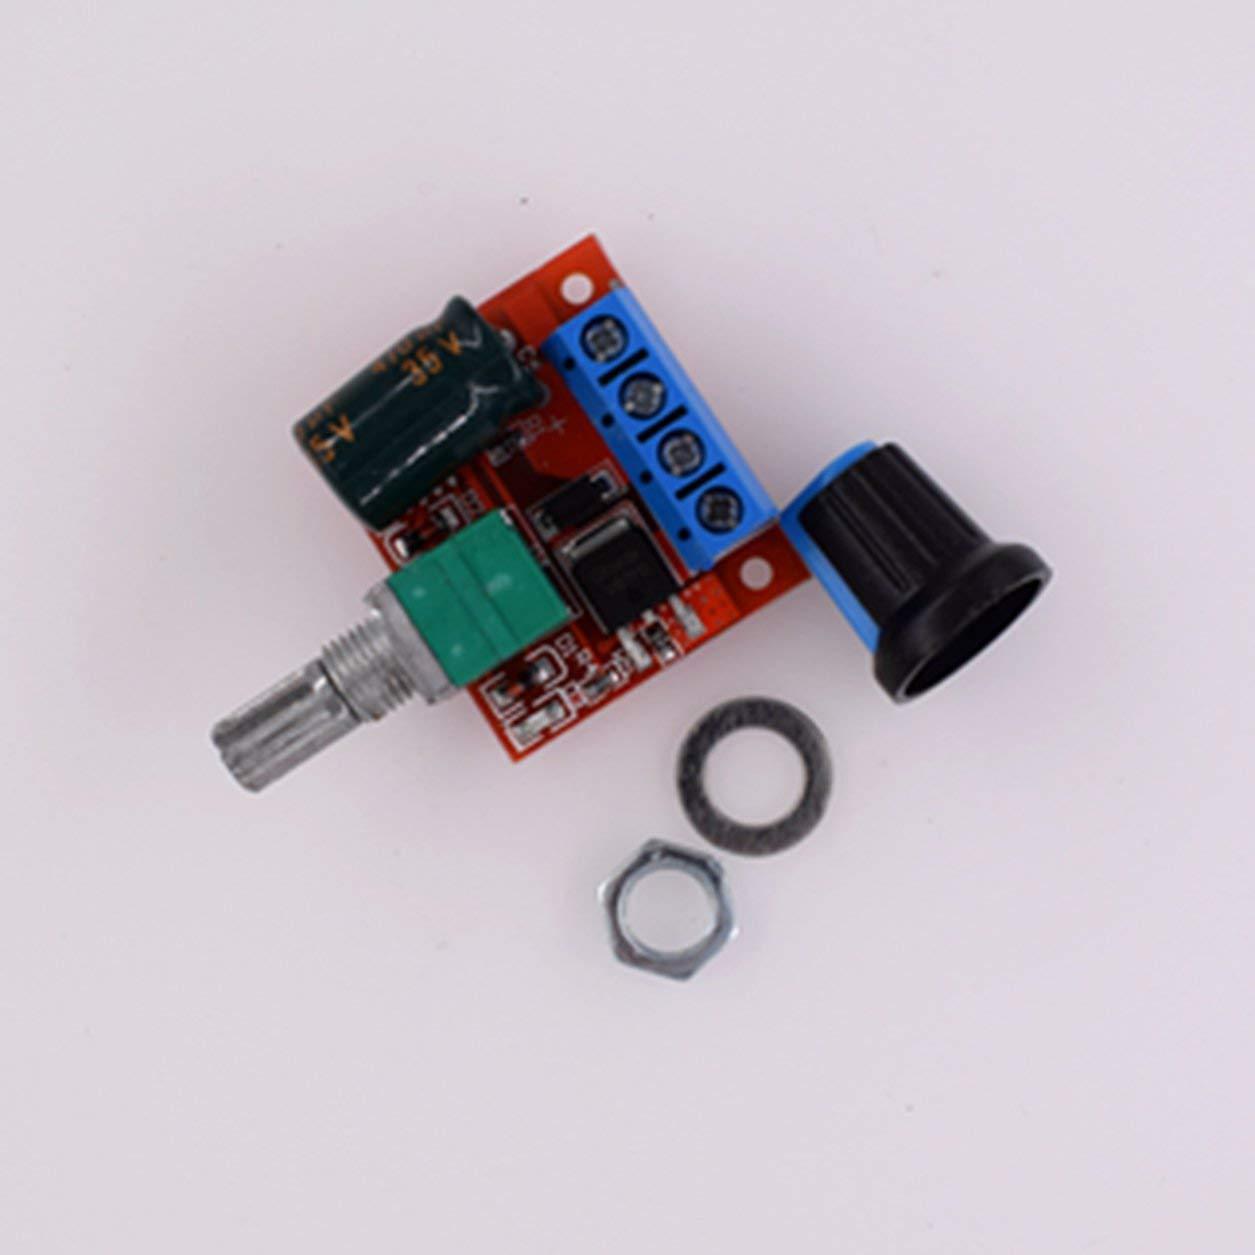 Color Dailyinshop PWM DC Motor Gobernador Regulador de Velocidad Funci/ón de Interruptor LED M/ódulo de atenuaci/ón